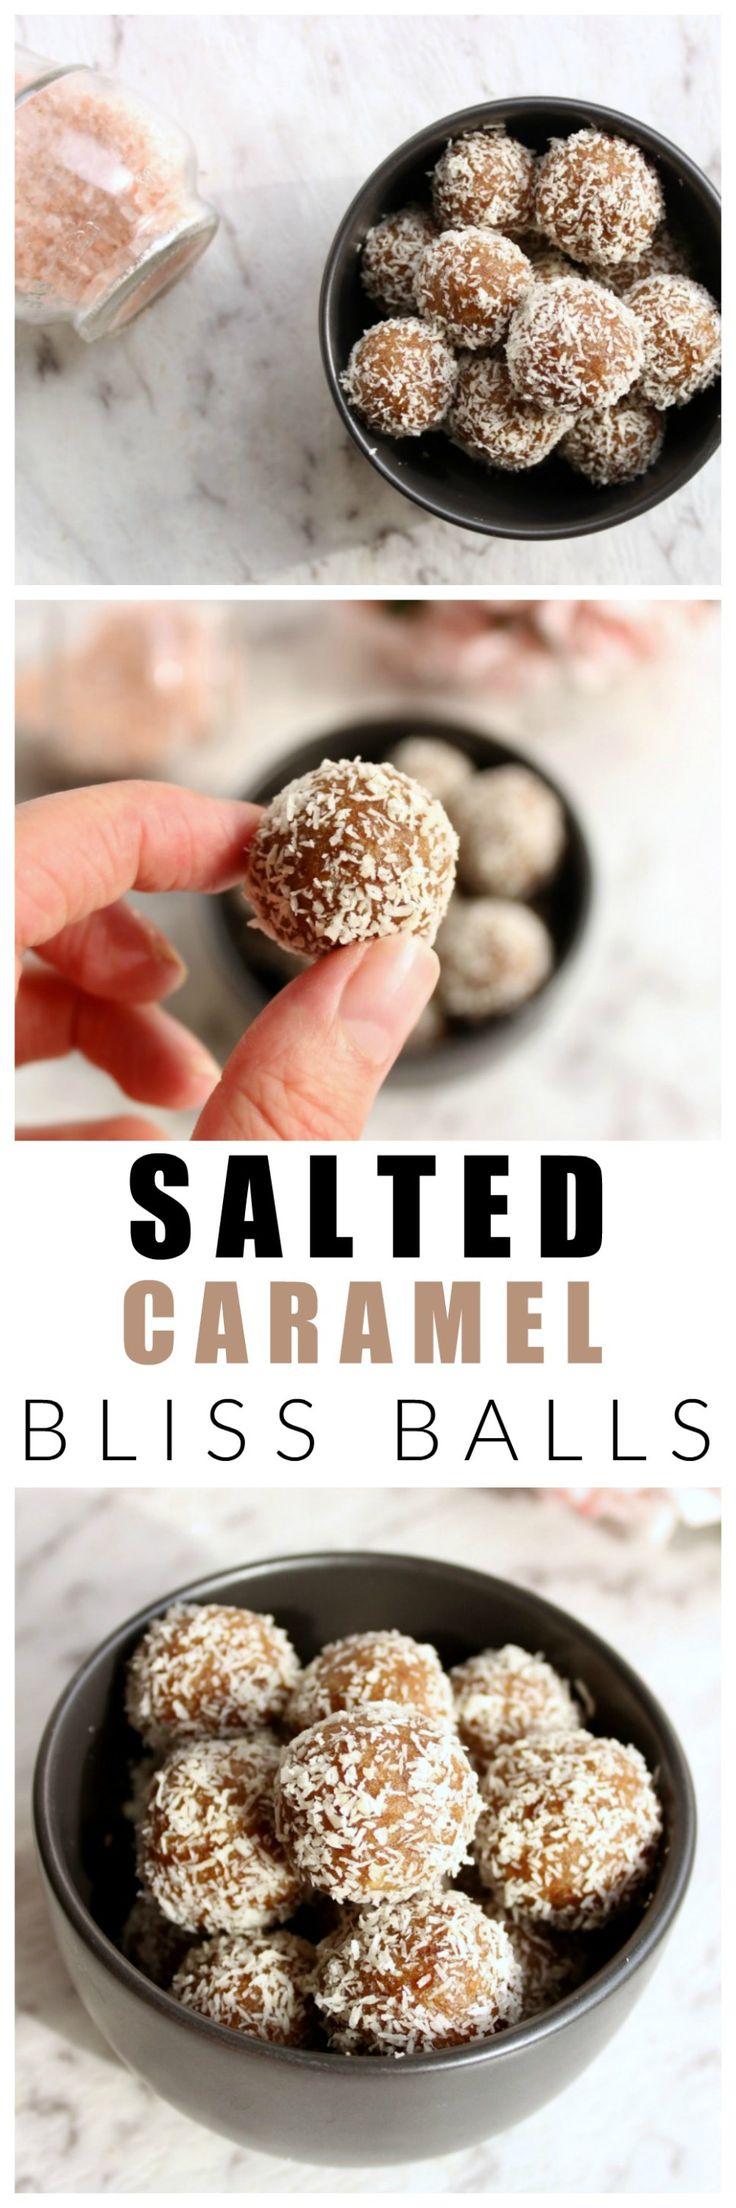 Salted caramel bliss balls   Healthy, refined sugar free